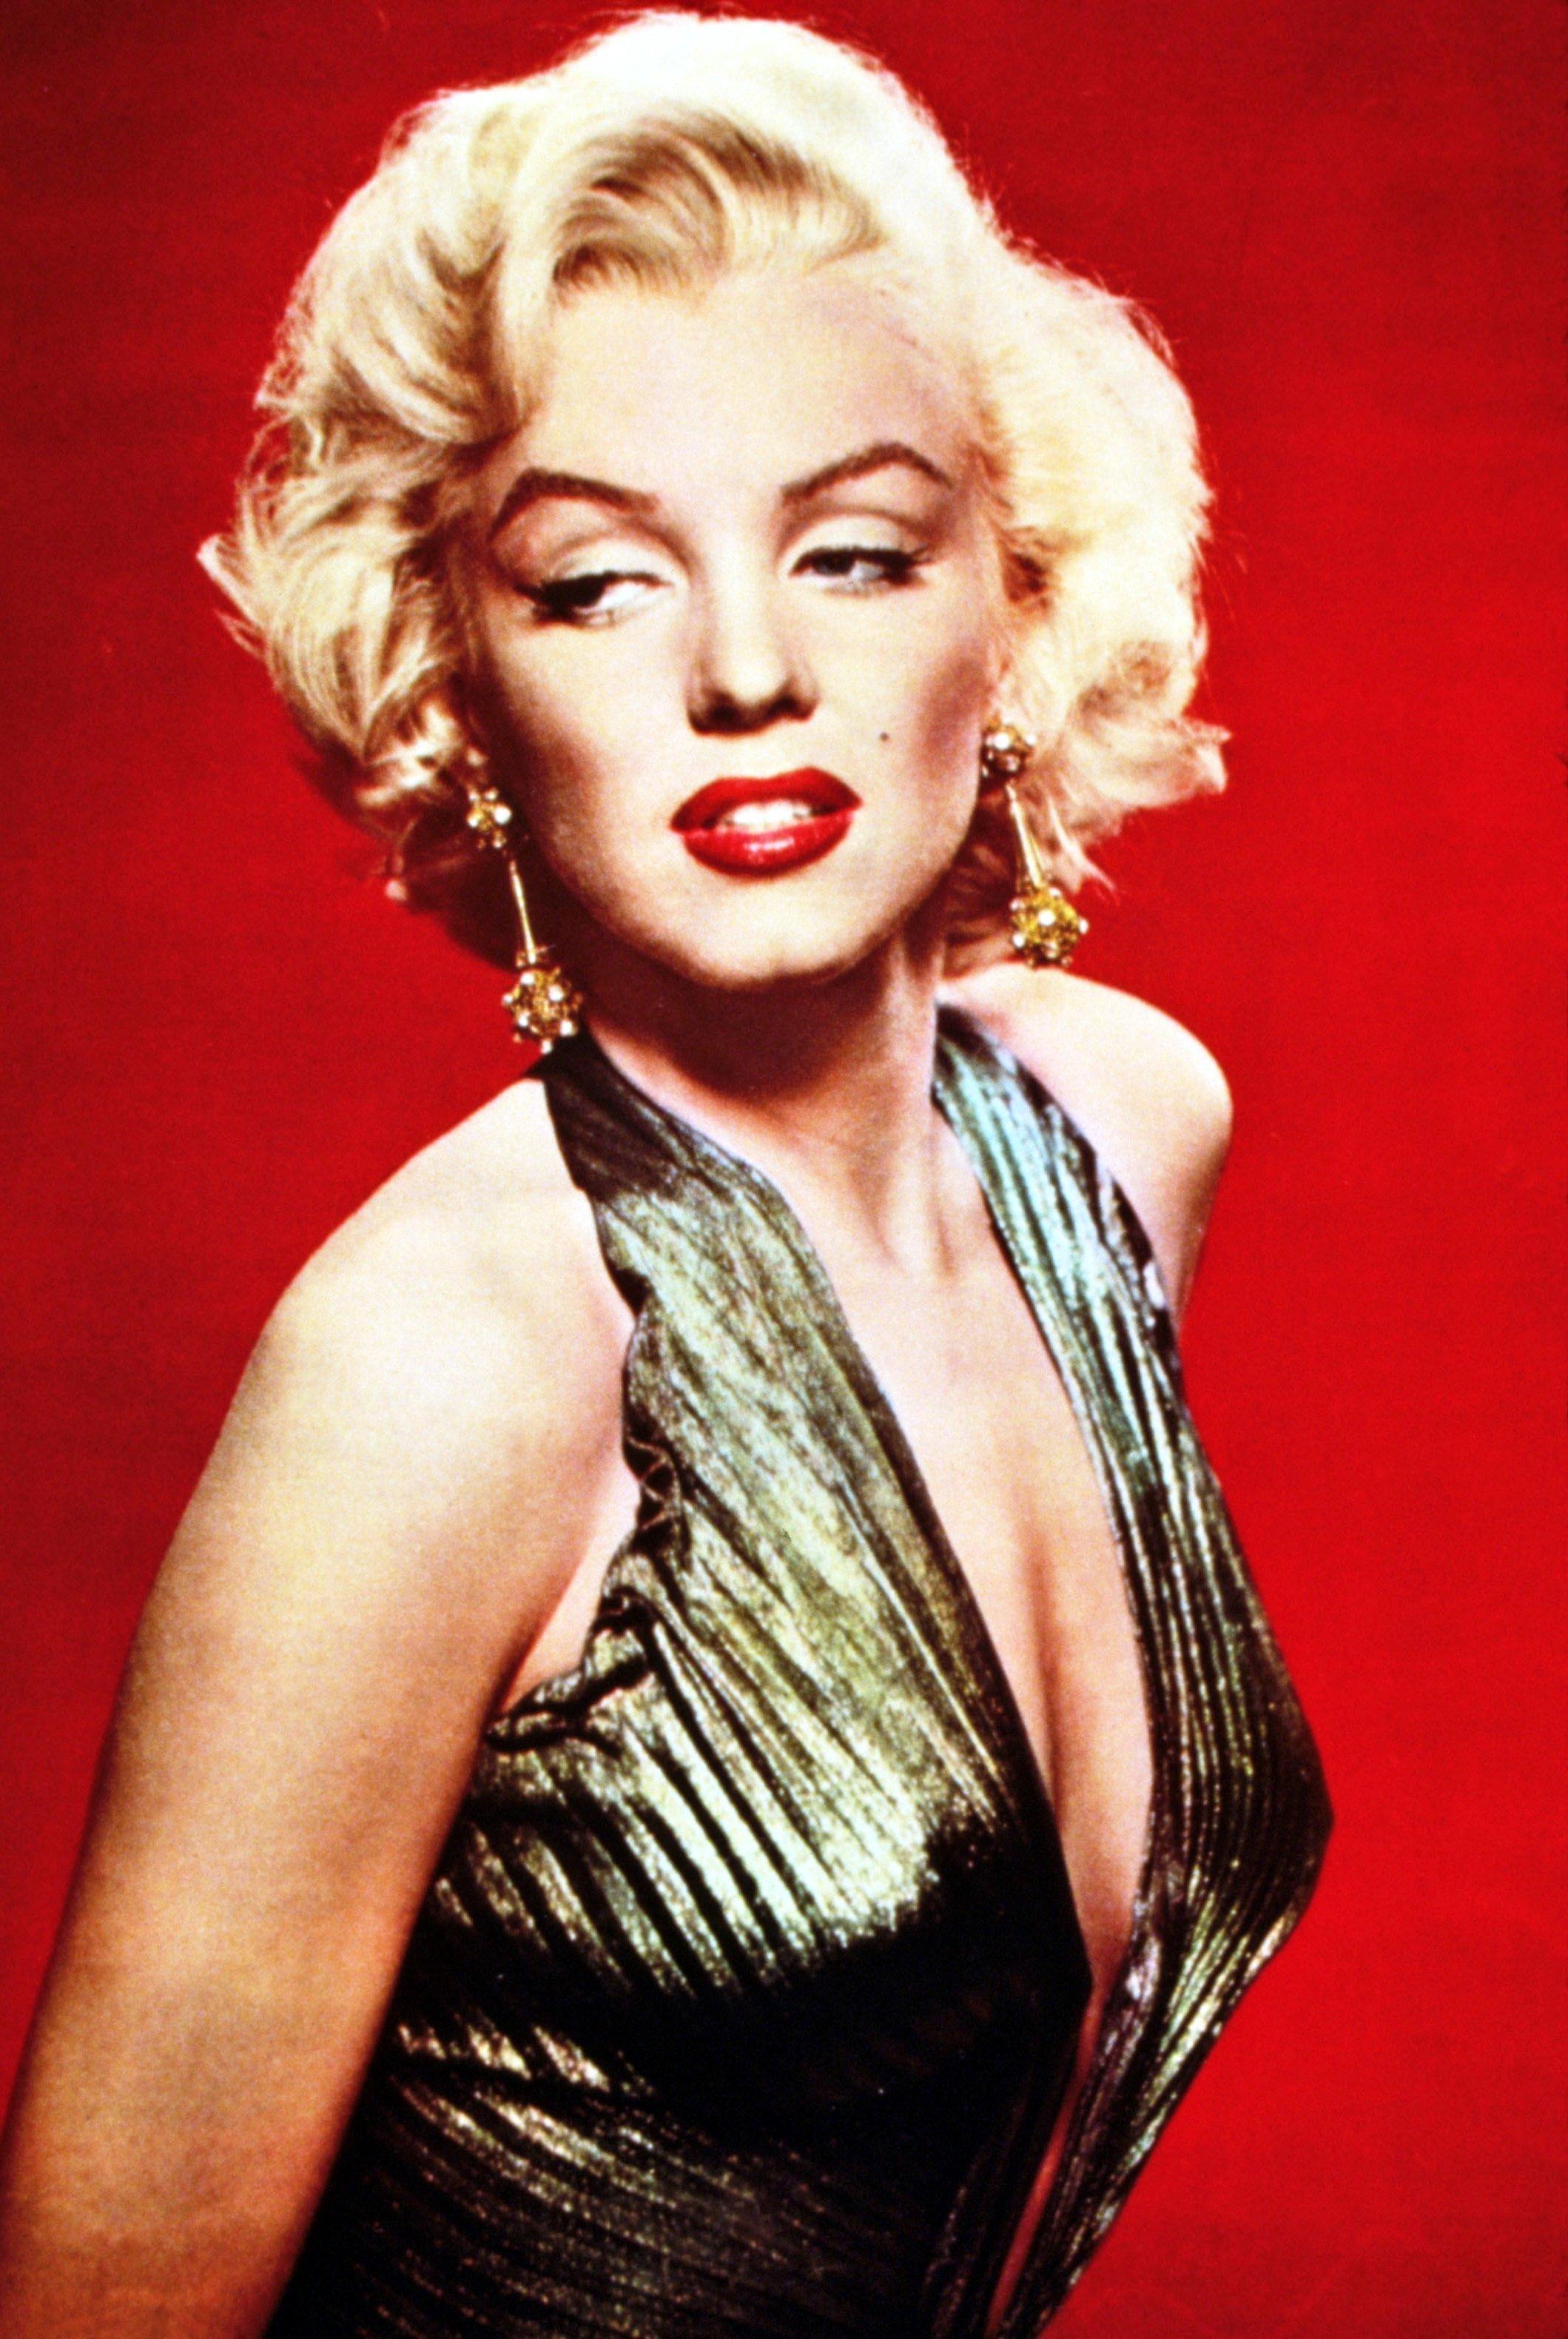 Marilyn Monroe Living Room Decor: 1301 Conspiracy Theories: Marilyn Monroe By Hannah Sharer